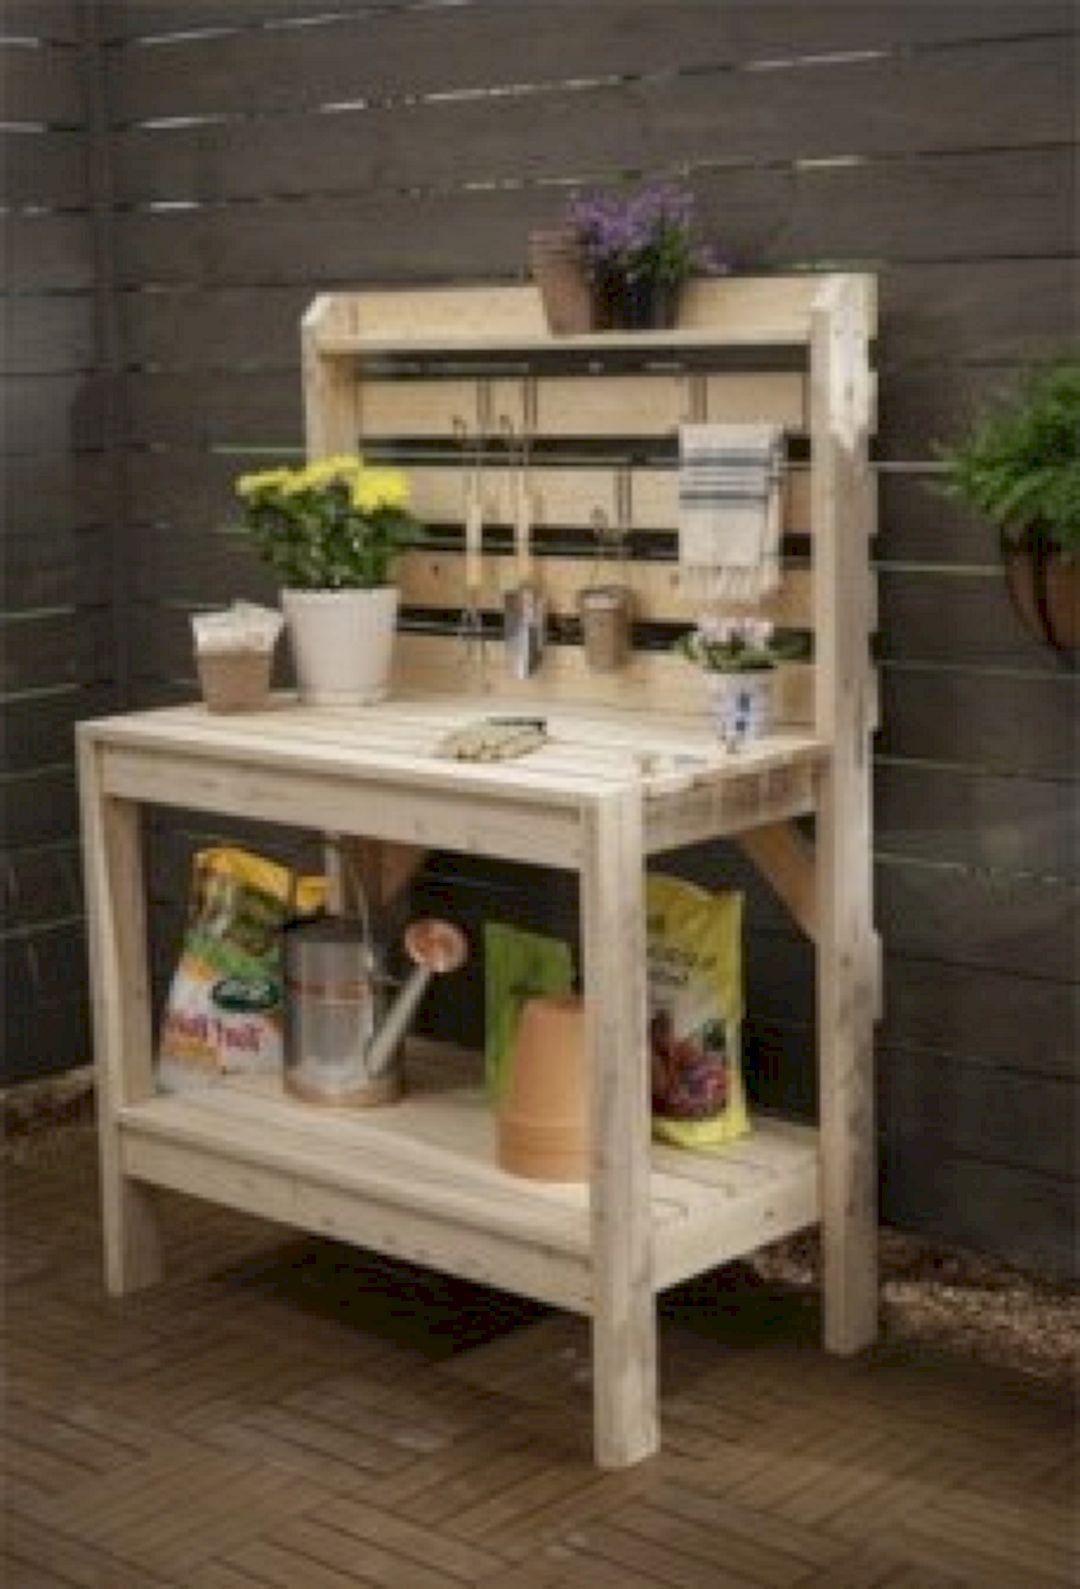 Incredible Wood Pallet Design Ideas